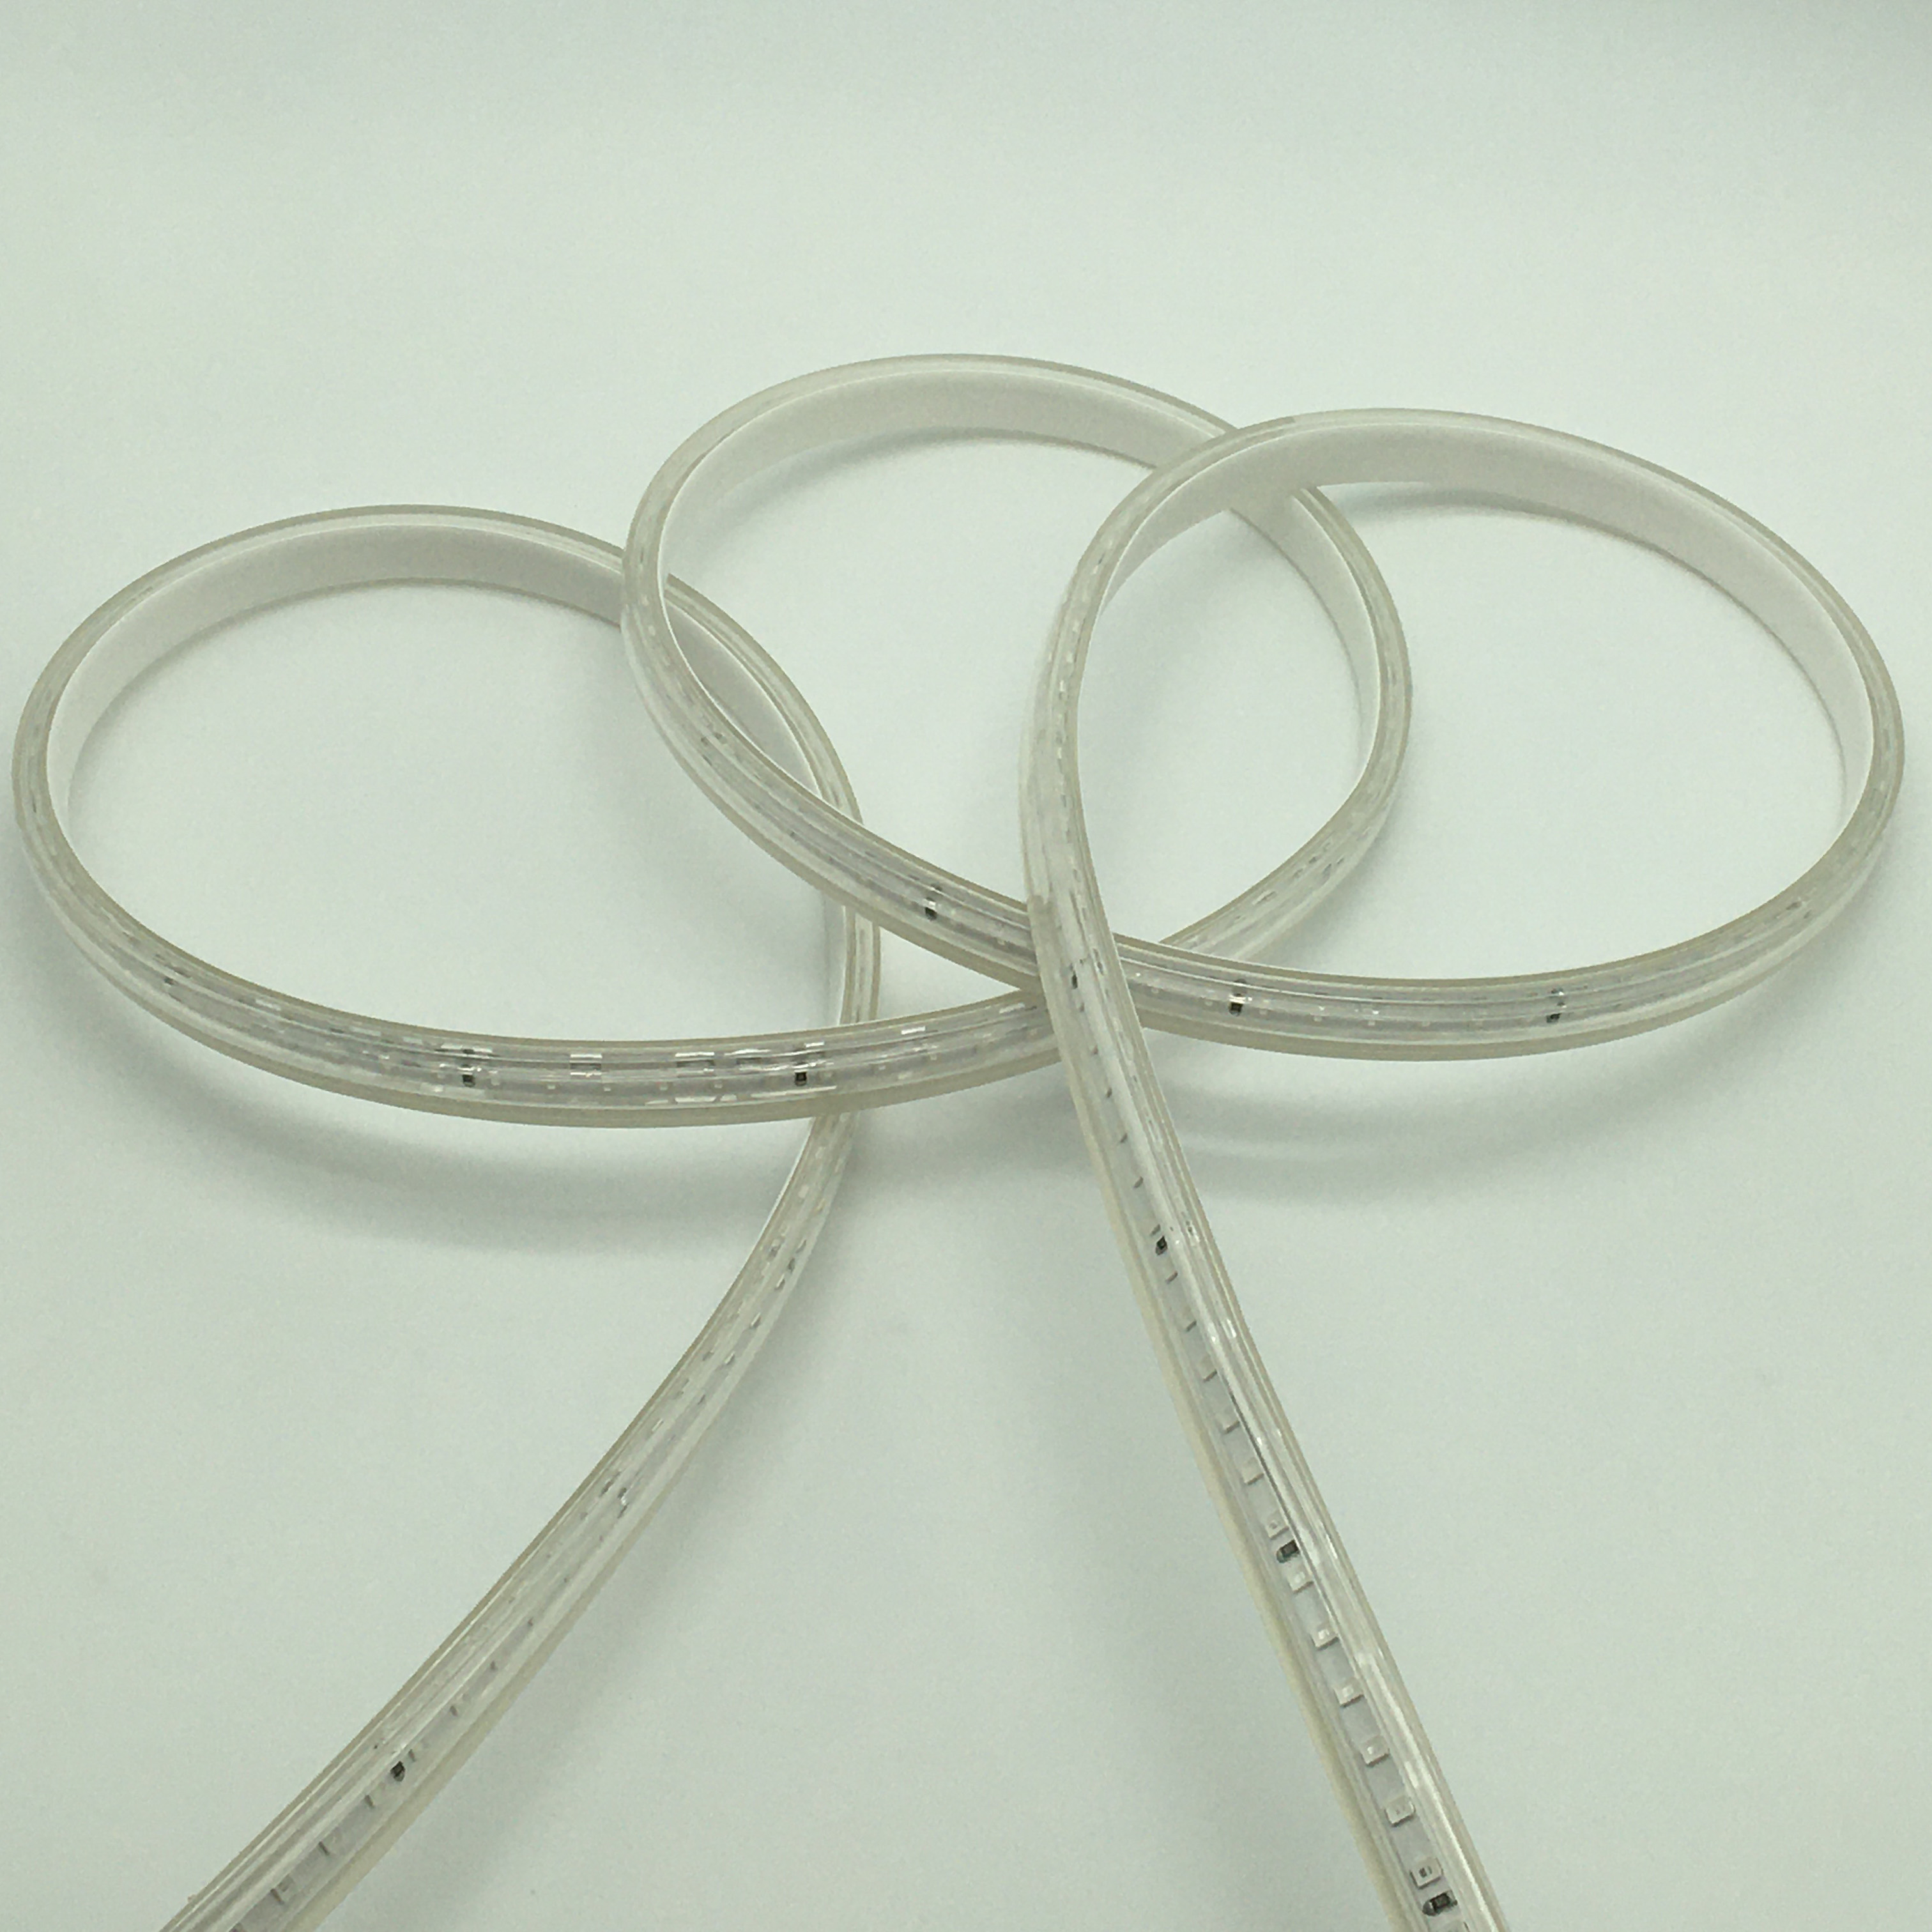 Wholesale LED light strip supplier customized design flexible  lighting strip